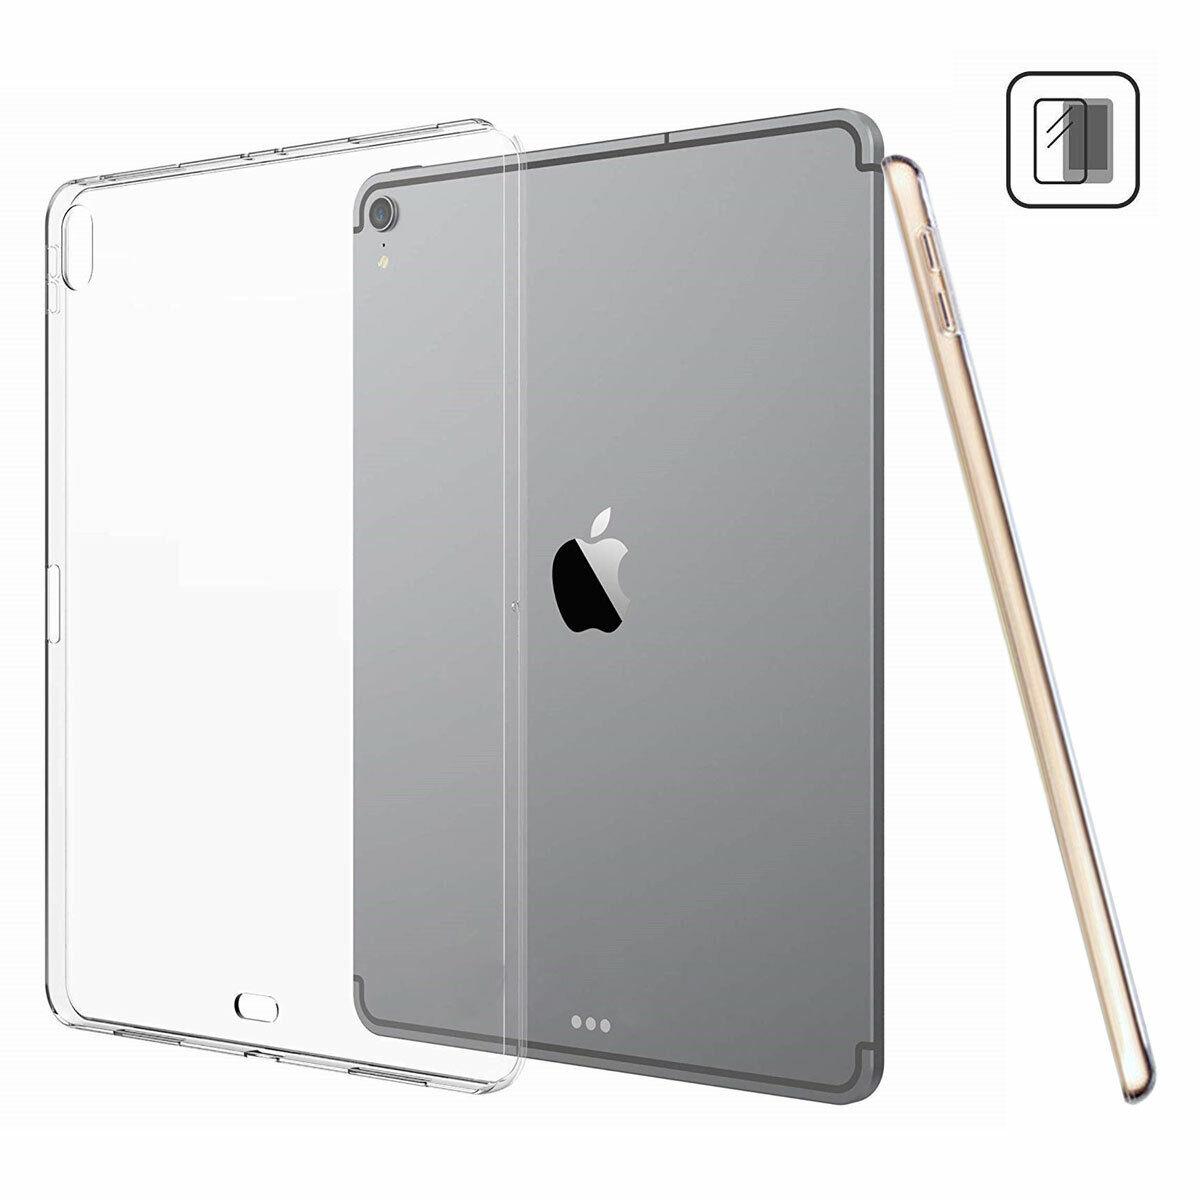 "For iPad Pro 12.9"" 3rd Generation 11"" 2018 Silicone Transpar"